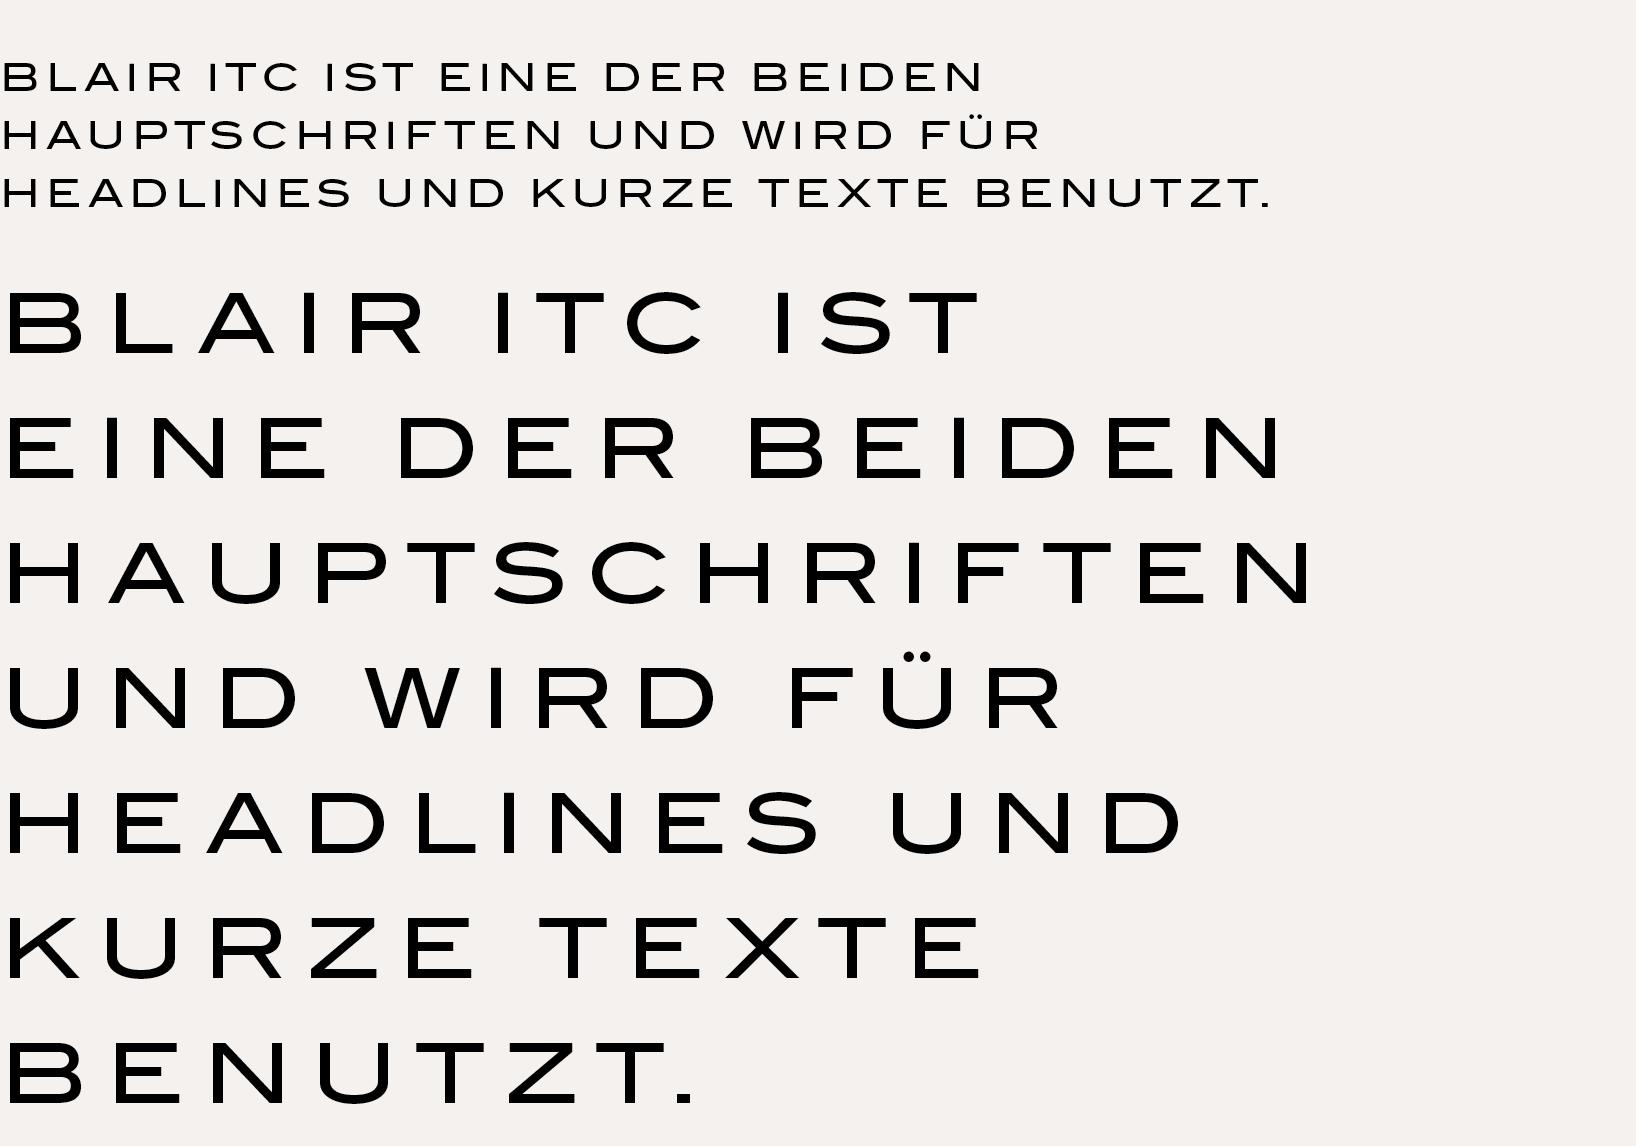 tg-meissen-ci-manual-blair-191112